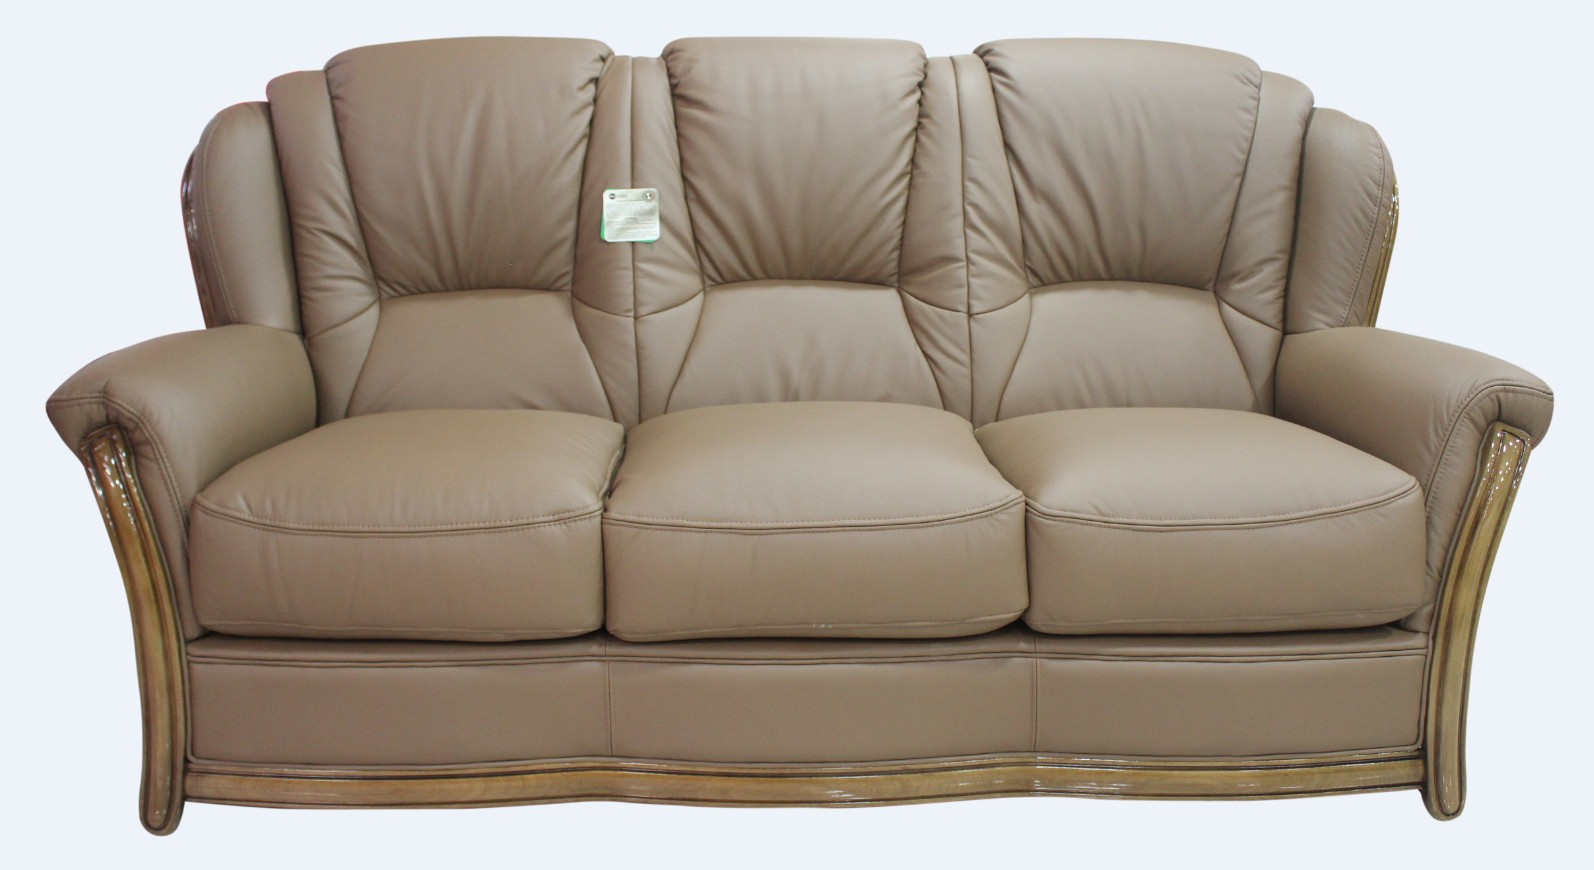 Seater Settee Pisa 3 Italian Nut Leather Sofa Offer Xnwp0nkz8o